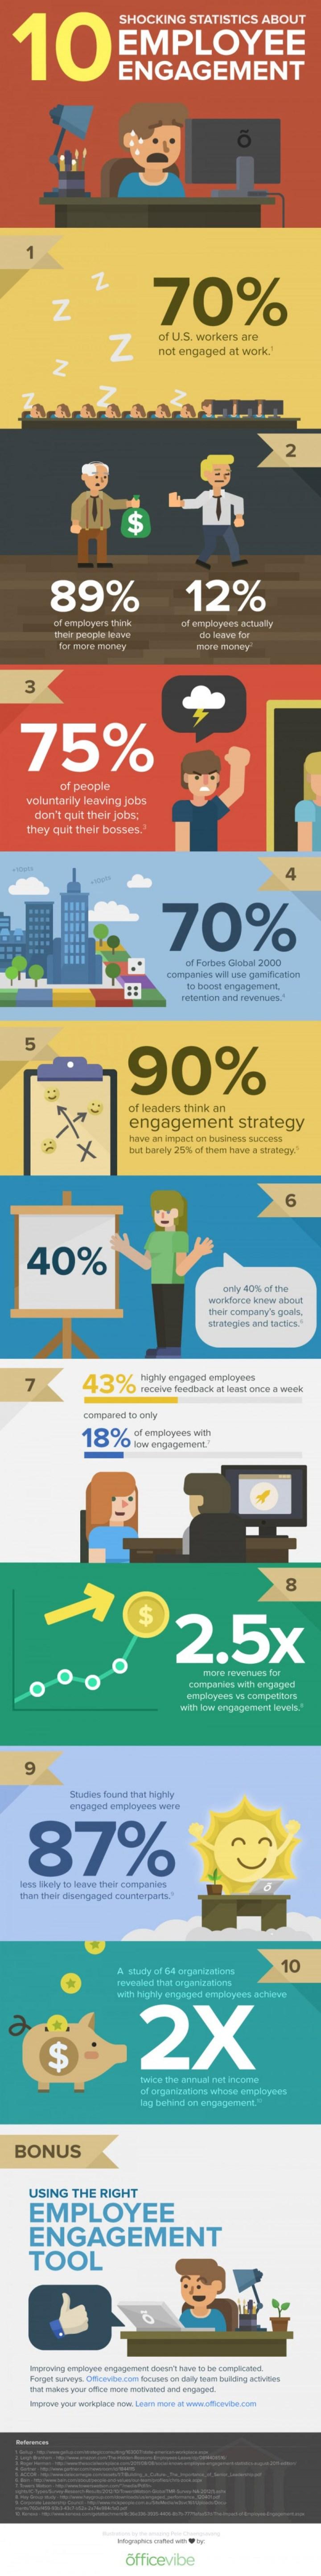 10-shocking-statistics-about-employee-engagement_52e82c76b45cb_w15006